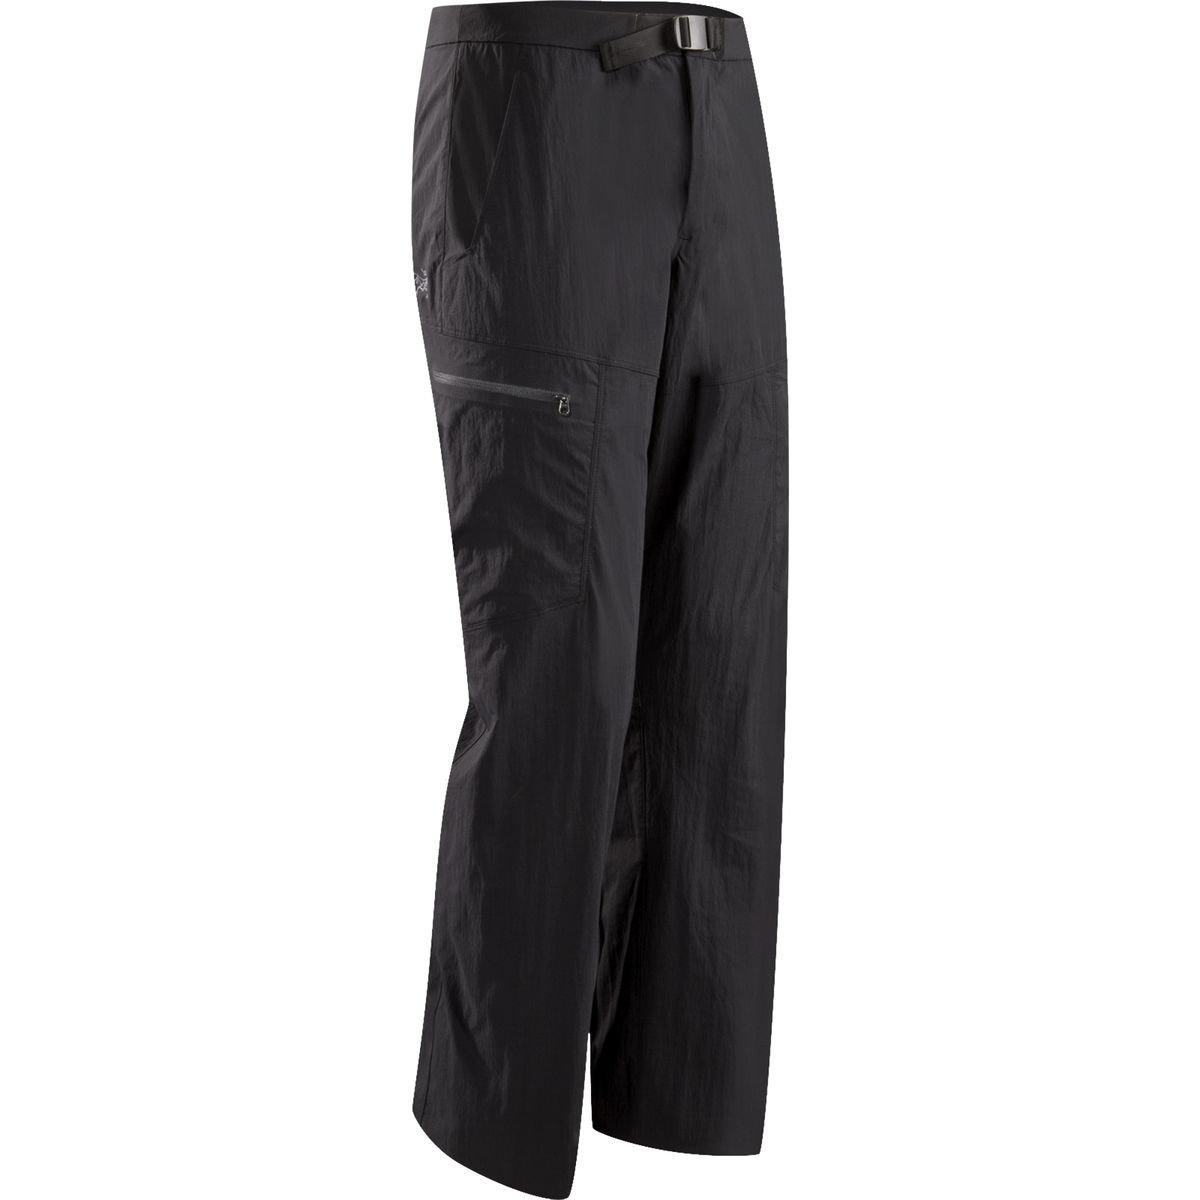 ARC'TERYX(アークテリクス) Palisade Pant Men's パリセード パンツ メンズ 17520 B00YXUBMIM 3432 ブラック ブラック 3432